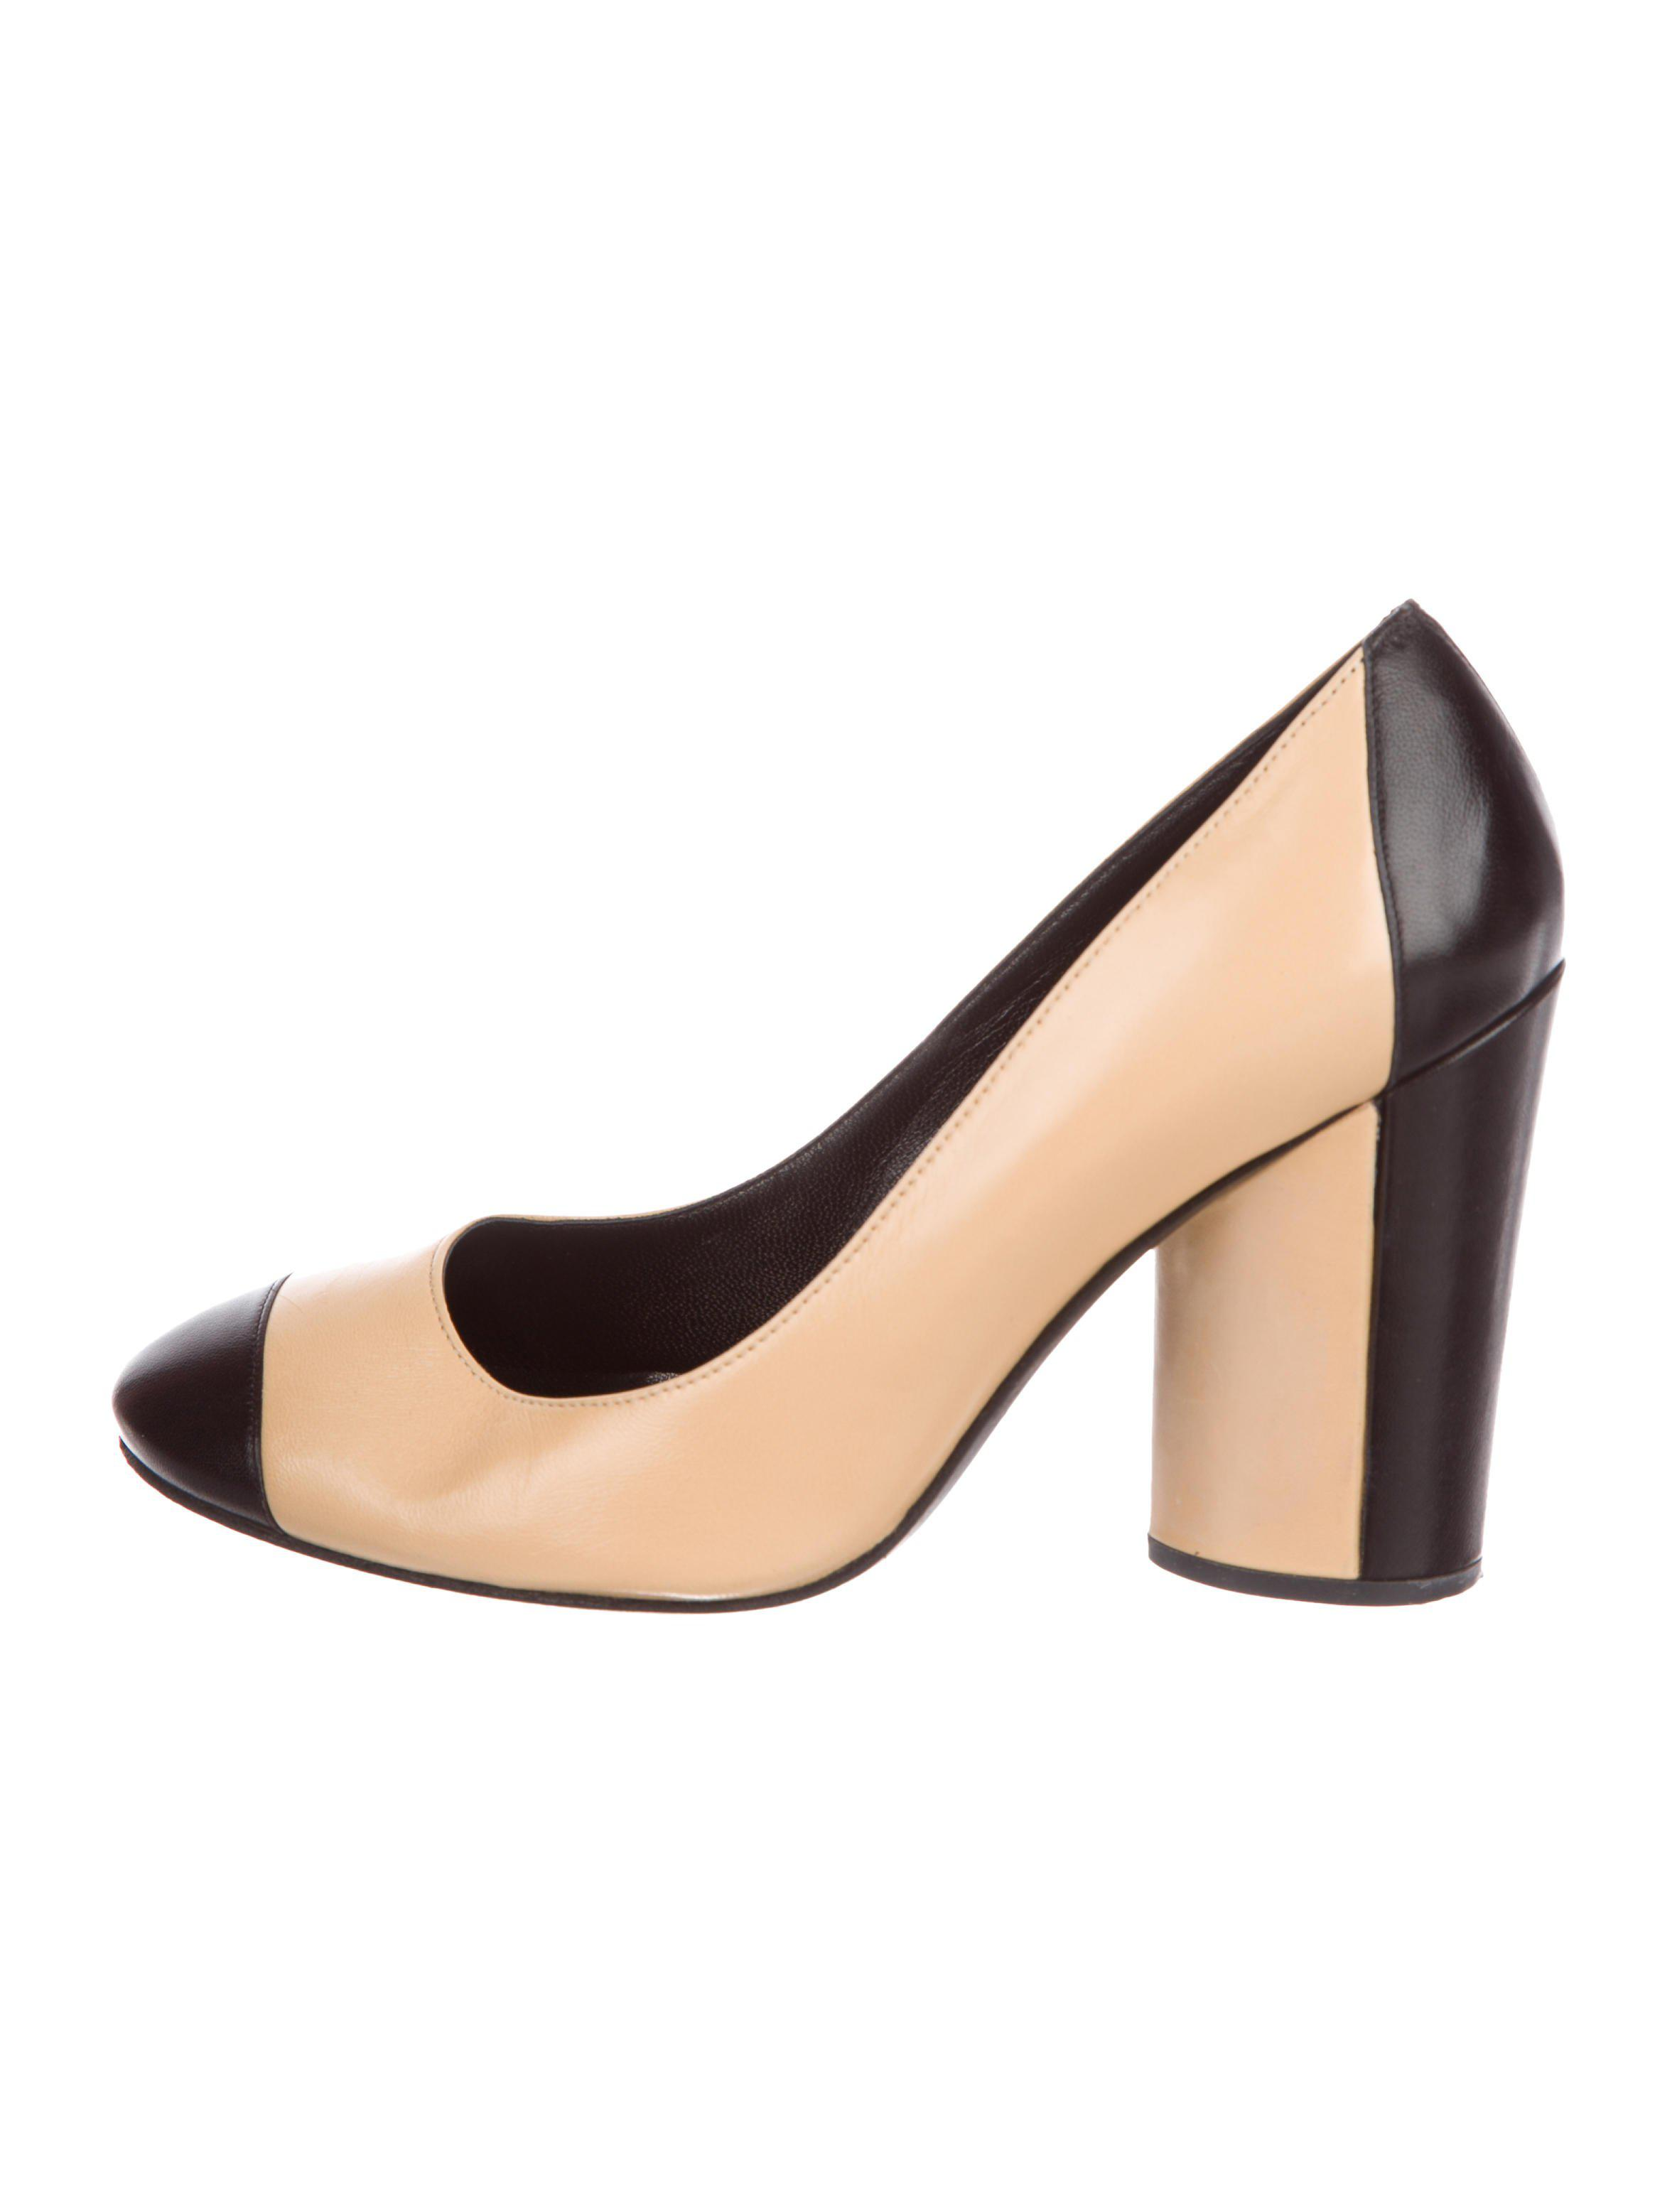 Lyst - Chanel Colorblock Cap-toe Pumps Black in Natural